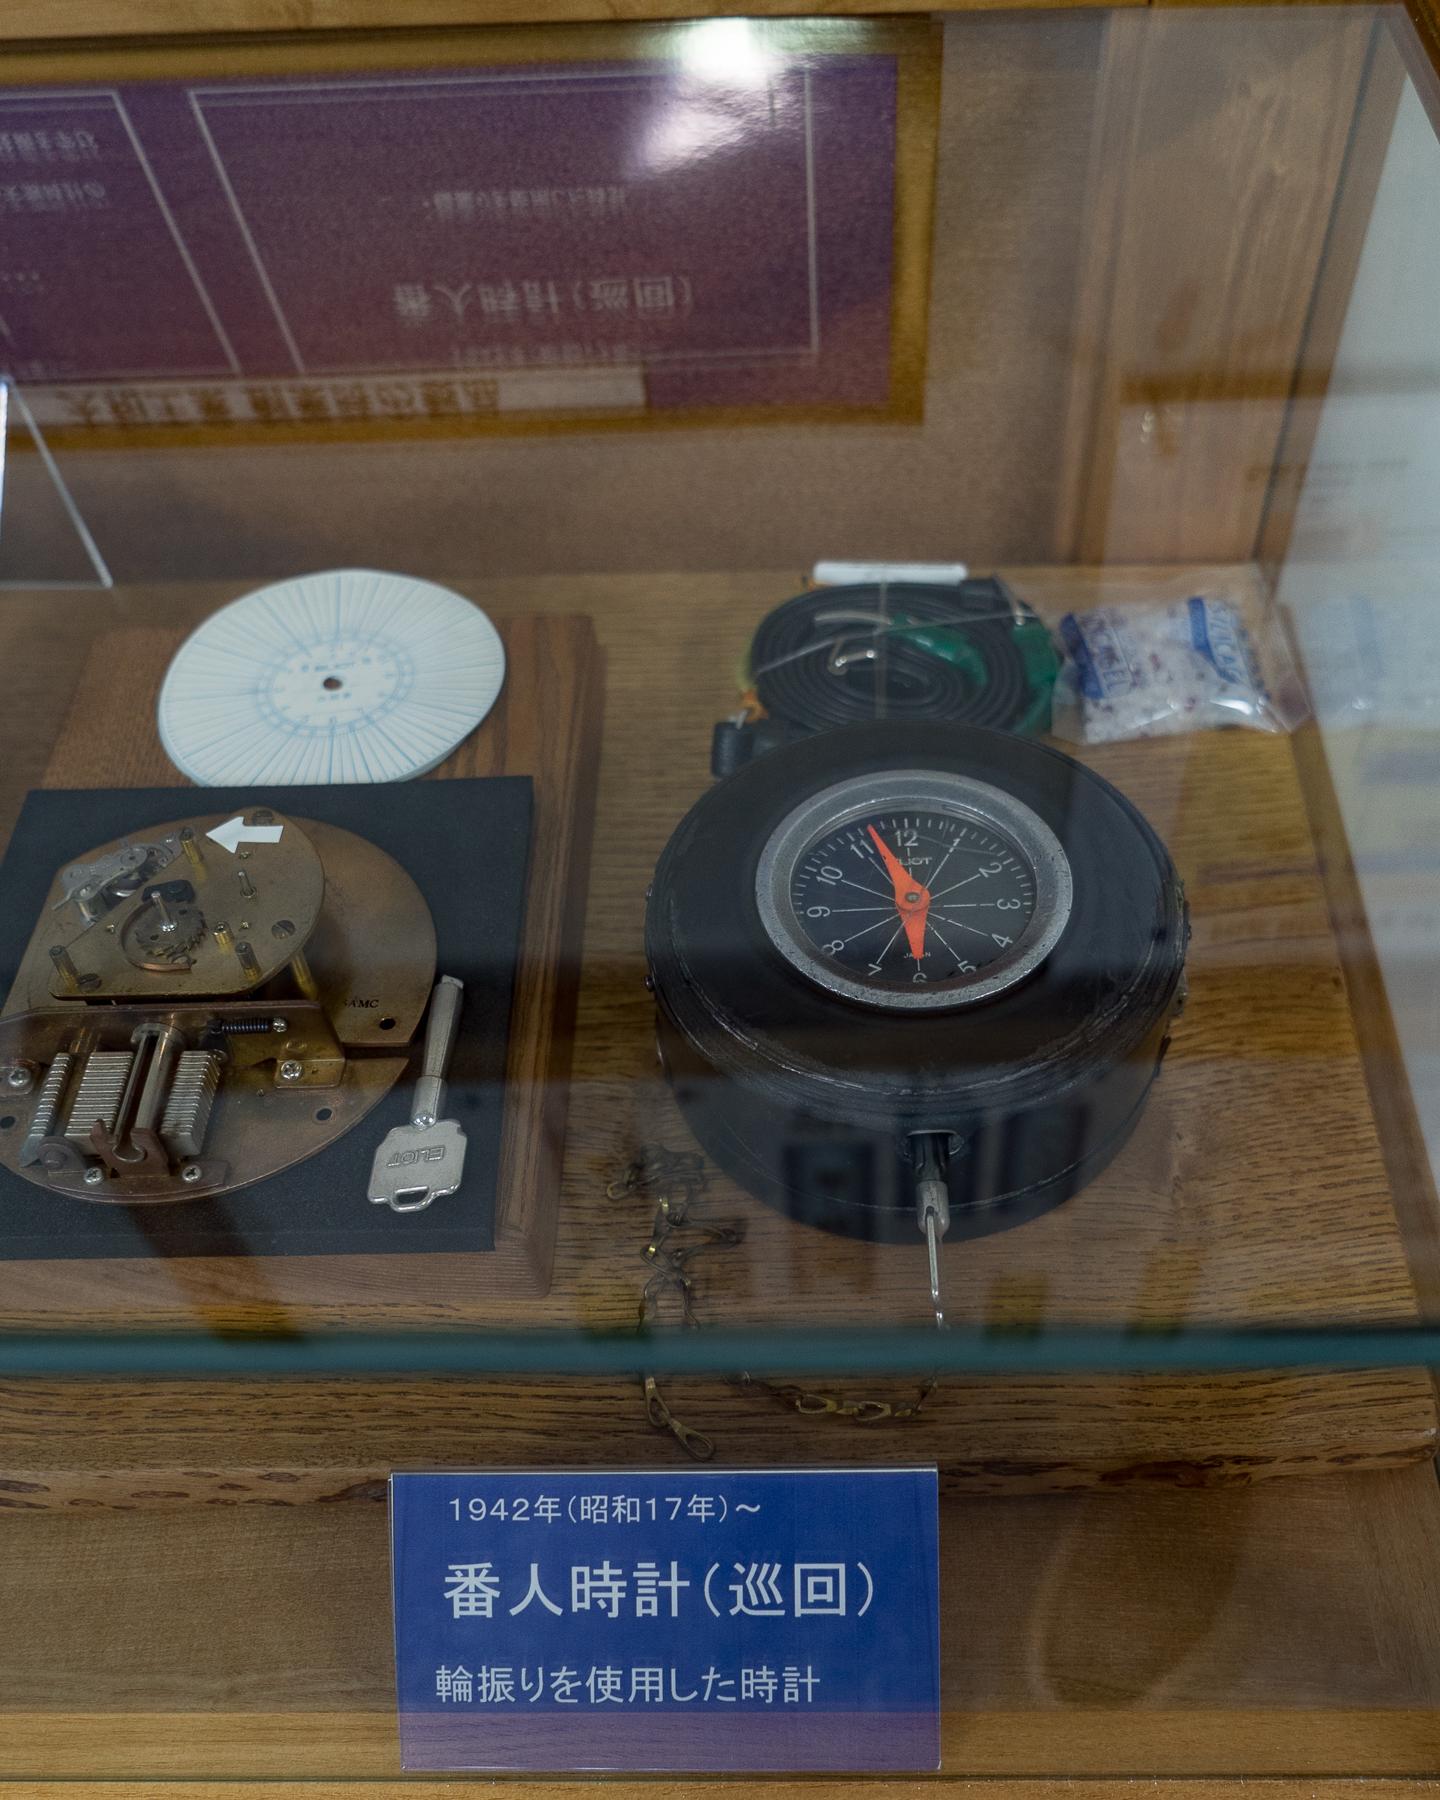 Watchman's Patrol Clock Display